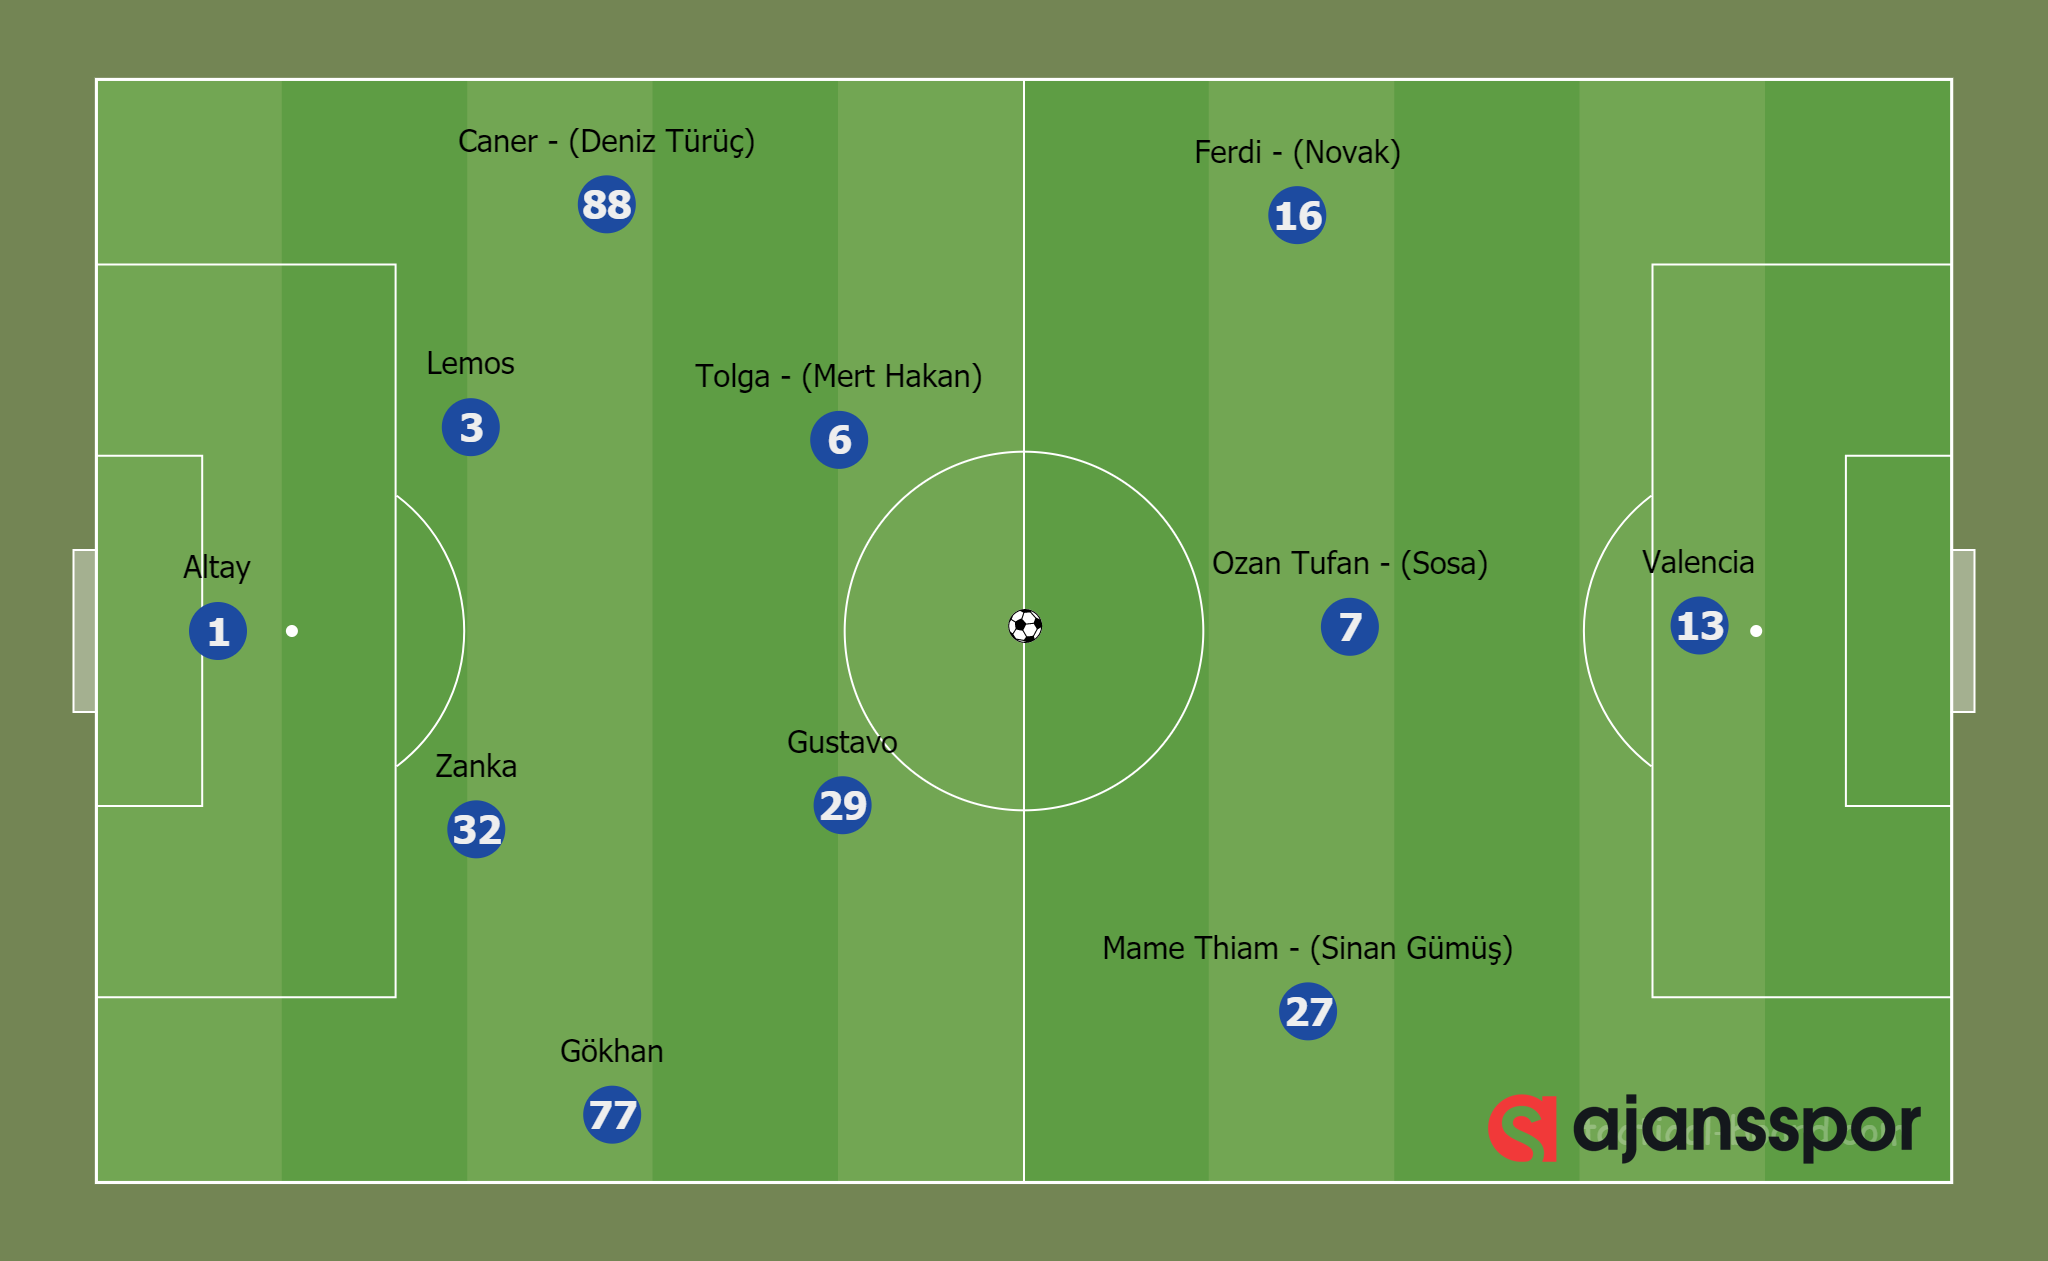 Fenerbahçe 0-0 Hatayspor (4-2-3-1)